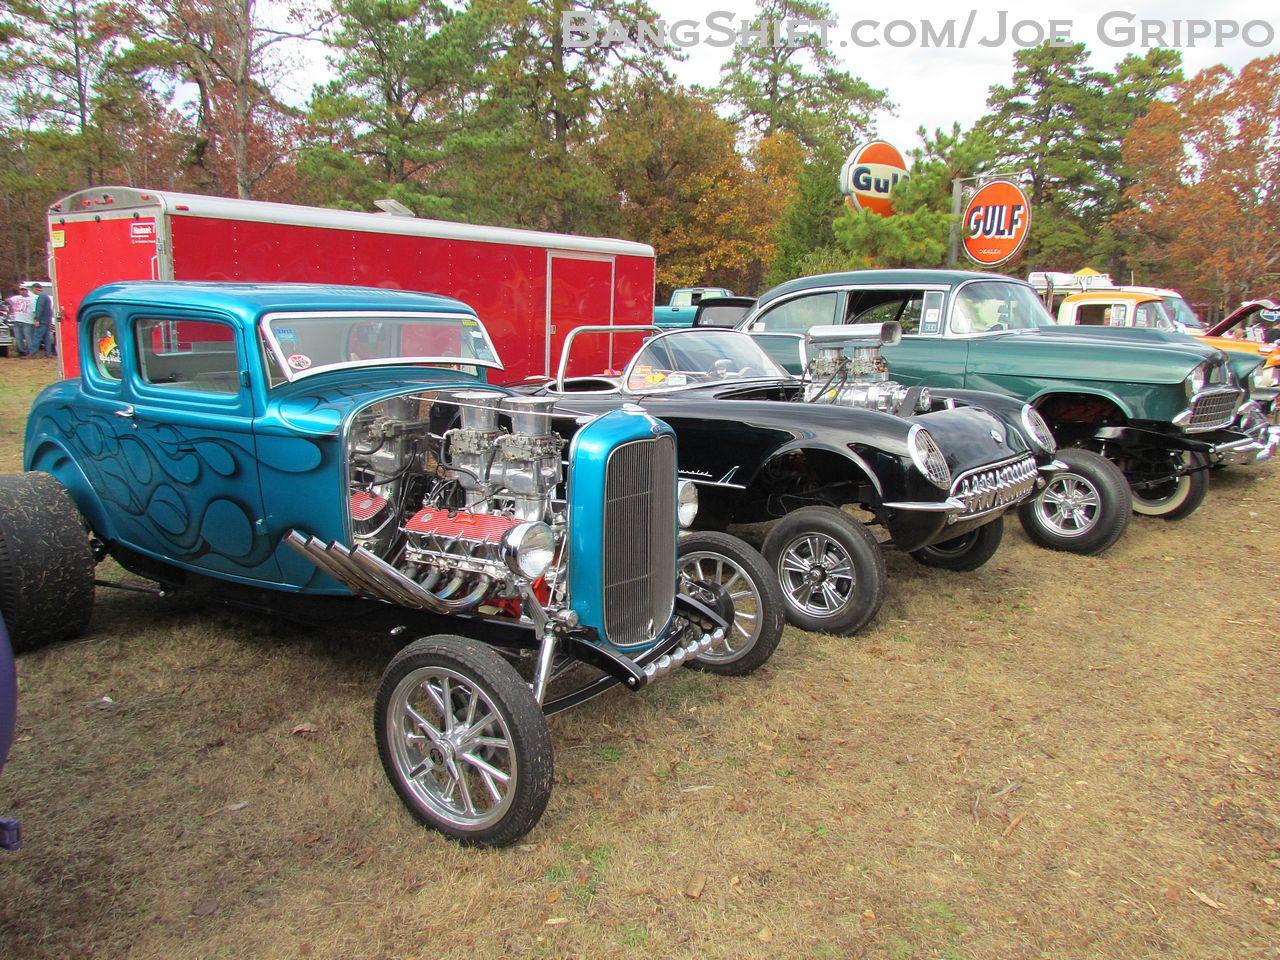 Gallery: Flemingu0027s Pumpkin Run 2013 U2013 The Cool Cars, Trucks, And Machines  Keep